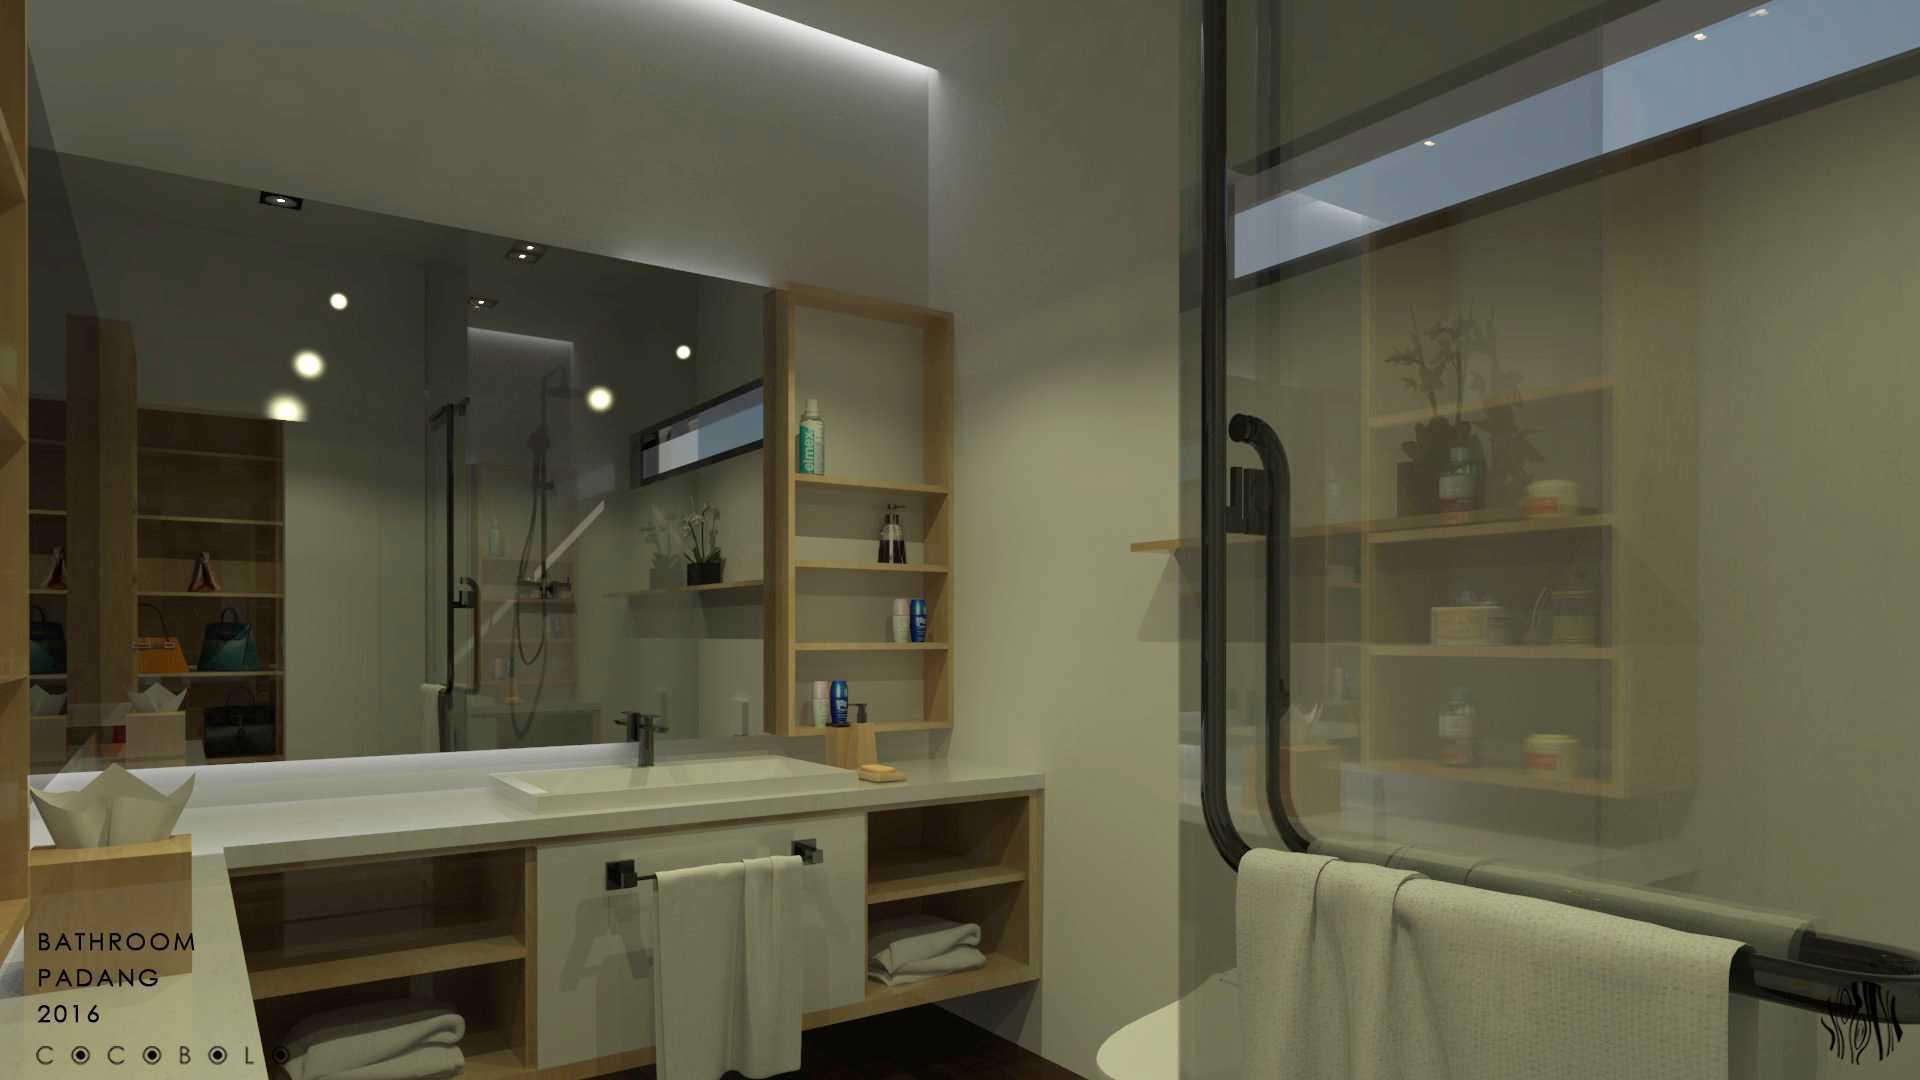 Cocobolo Studio D House Padang, Indonesia Padang, Indonesia Bathroom Minimalis,modern  18264